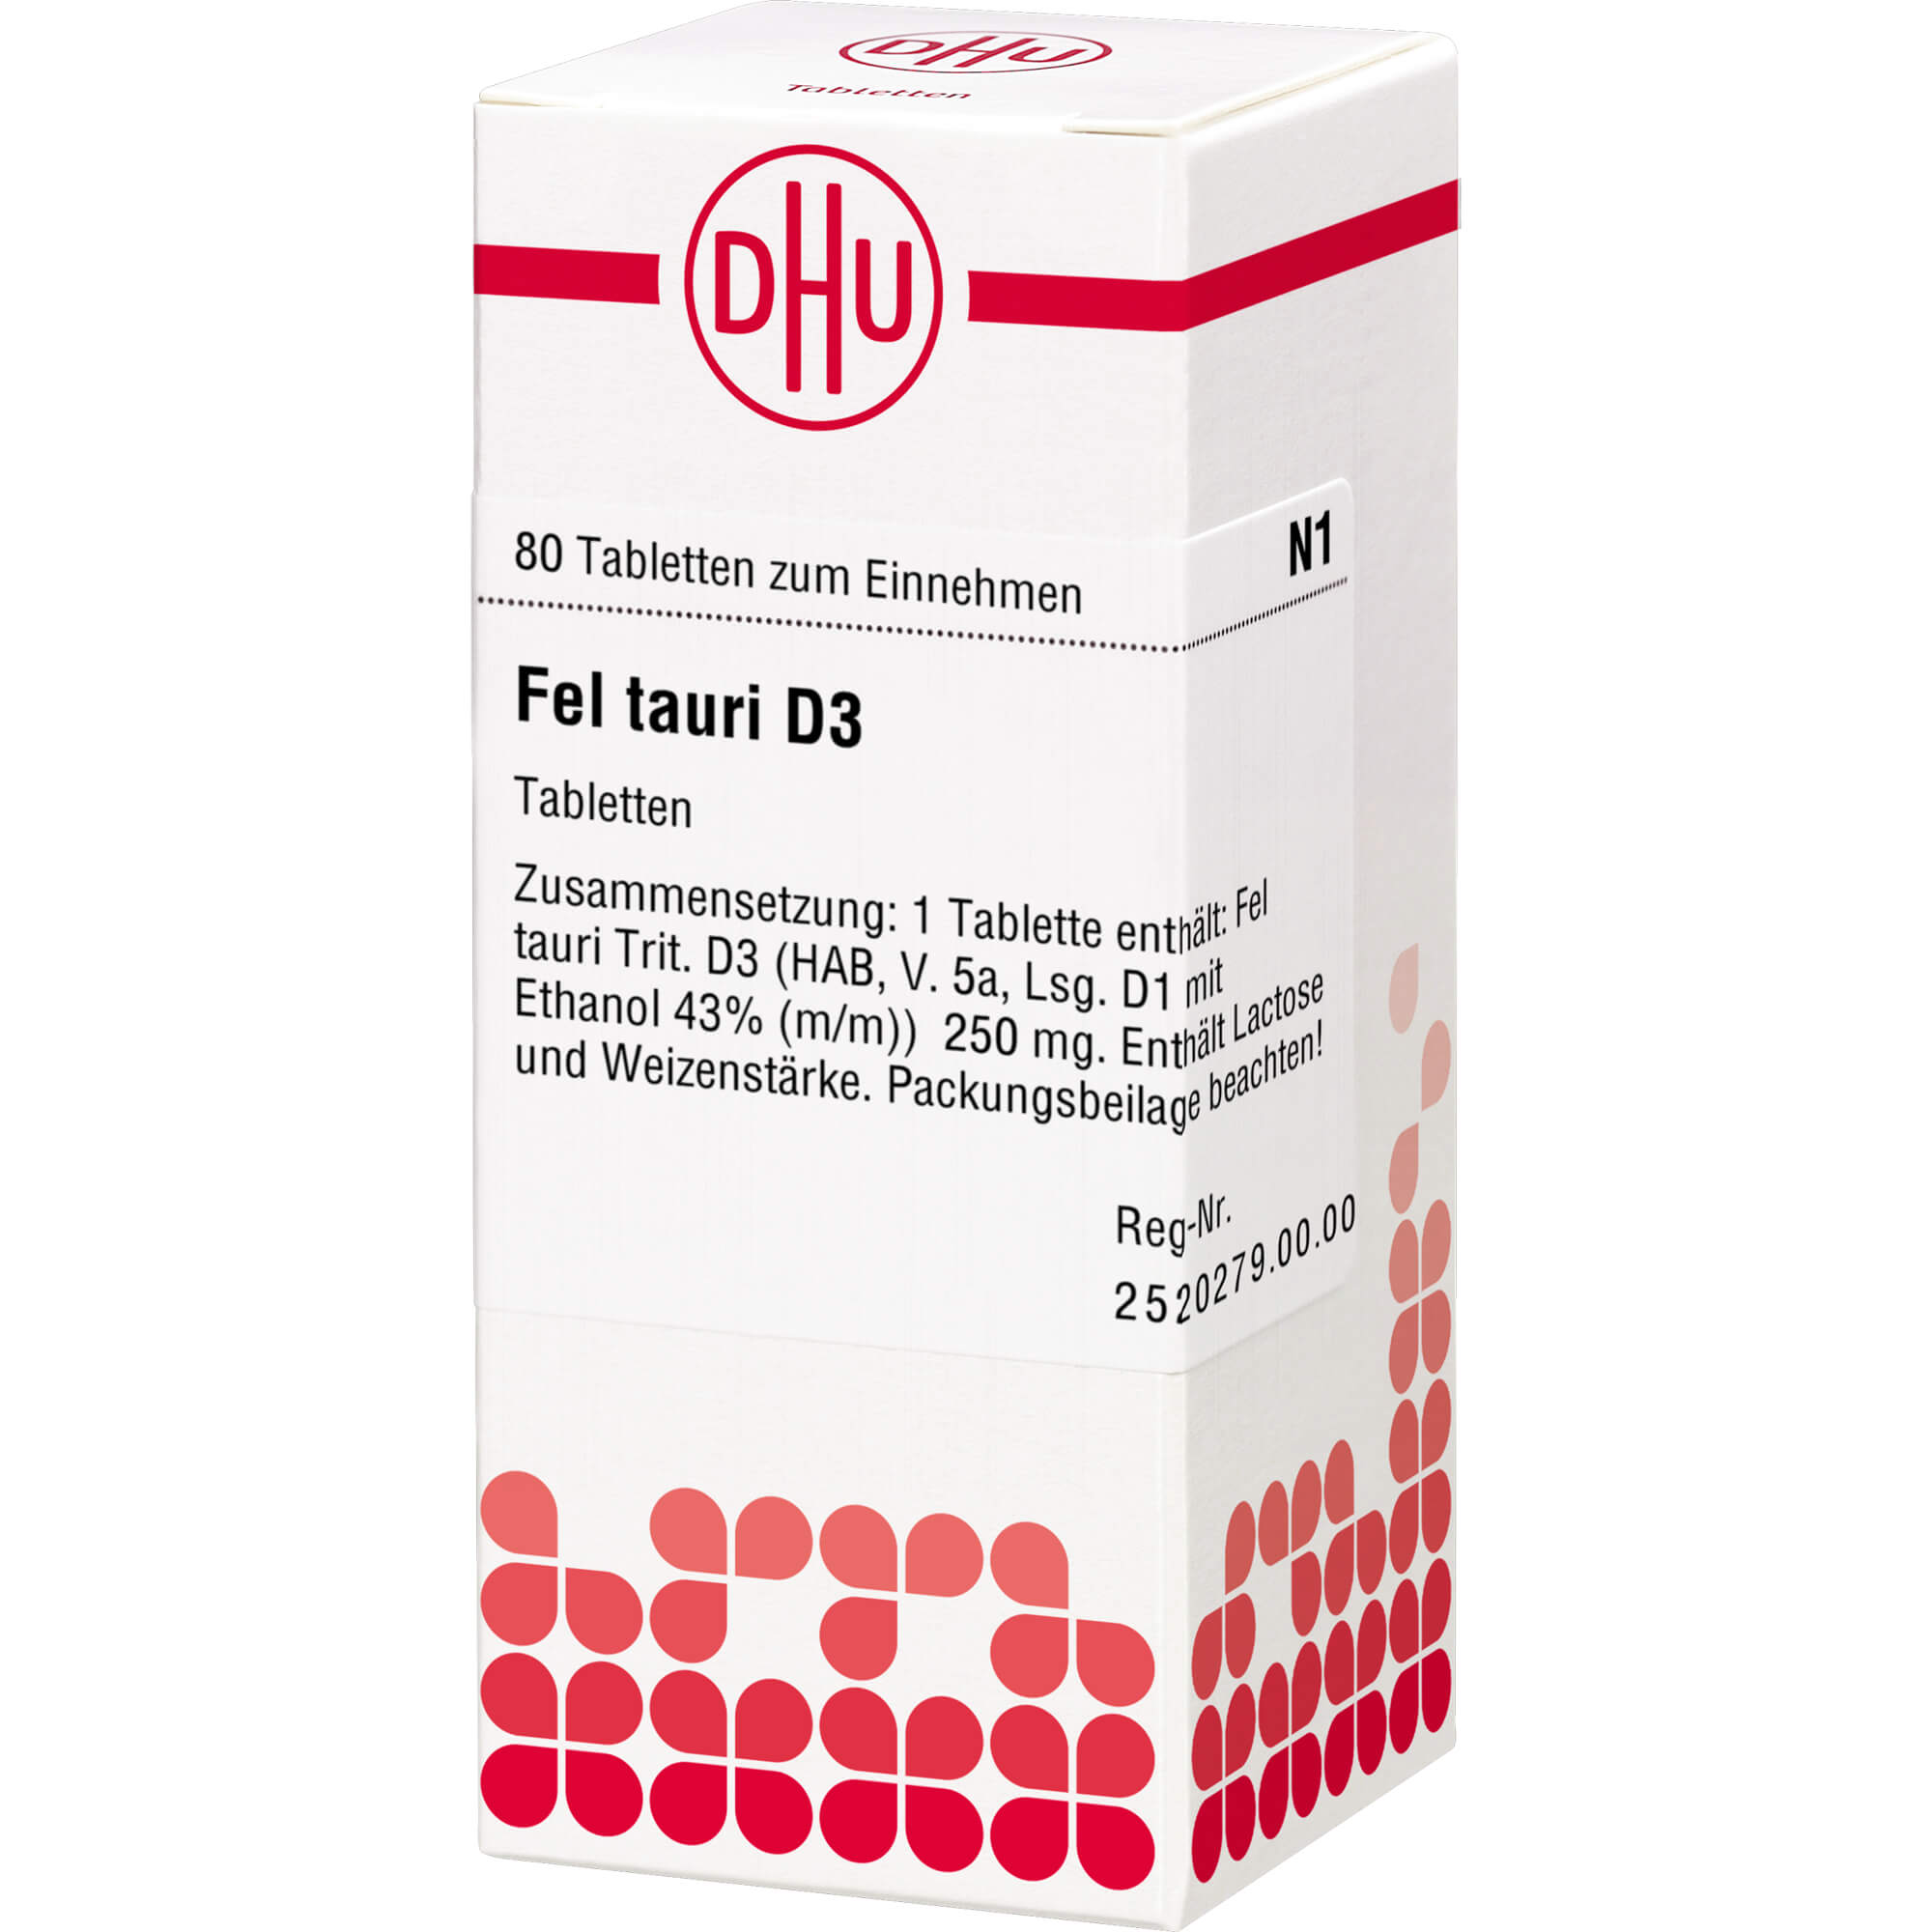 FEL TAURI D 3 Tabletten